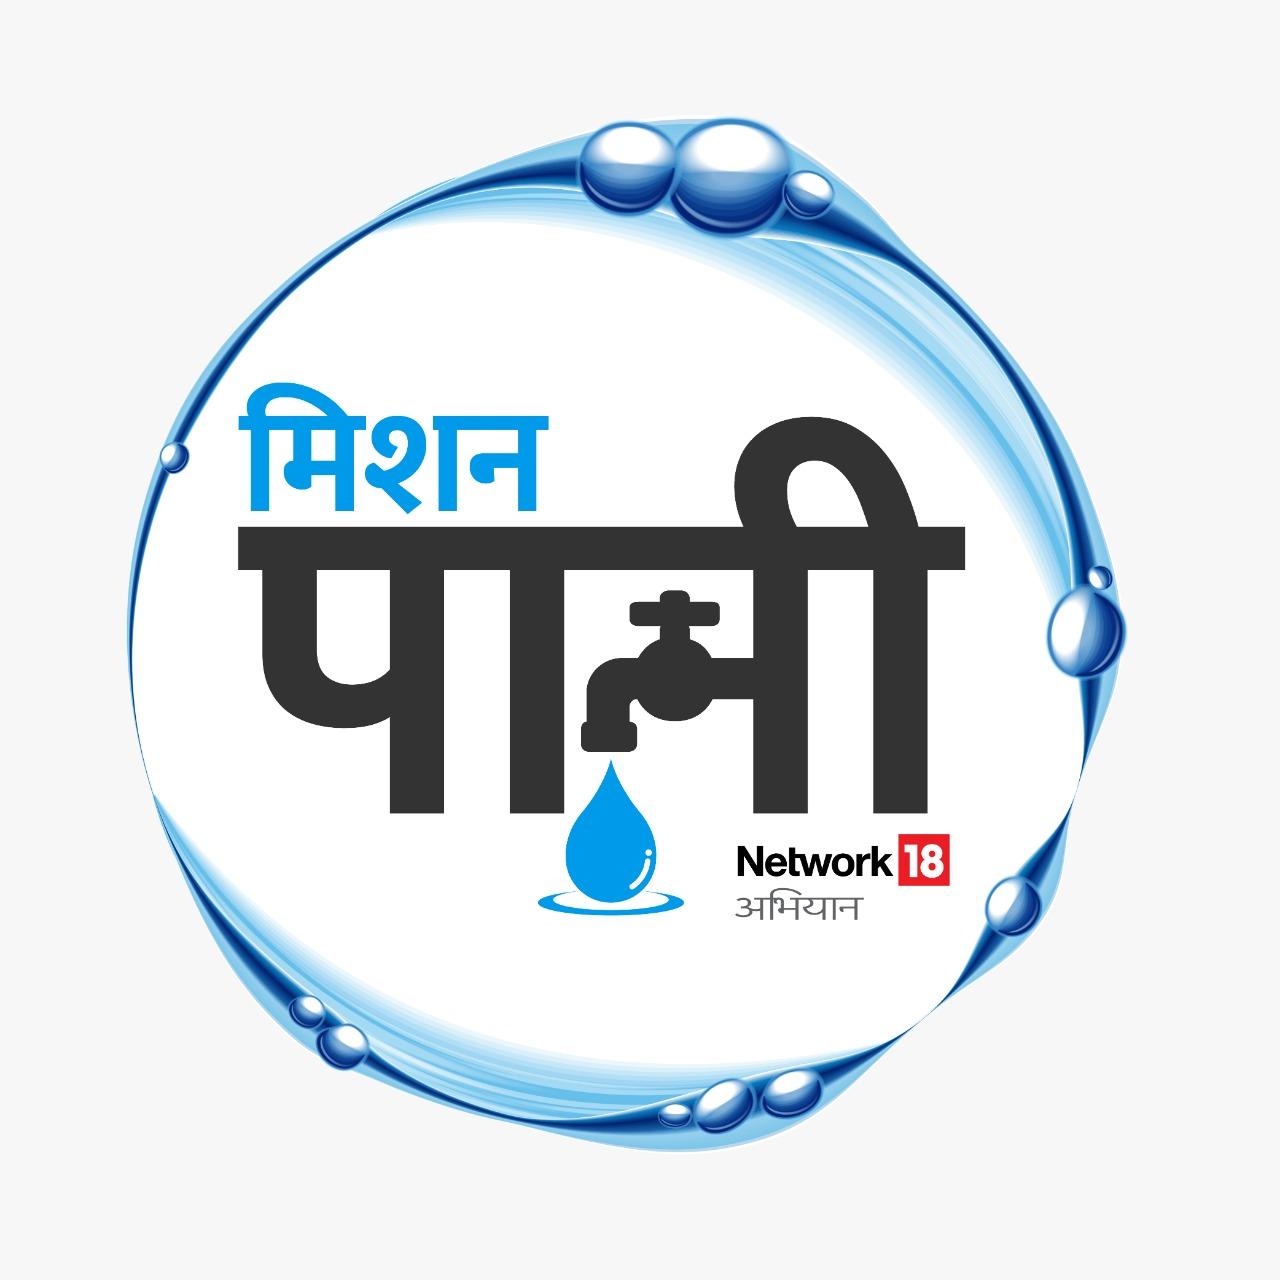 mumbai rains, mumbai floods update, damage due to mumbai rains, mumbai floods reasons, mumbai rains forecast, मुंबई बारिश, मुंबई बाढ़ स्थिति, मुंबई बाढ़ में नुकसान, मुंबई बाढ़ के कारण, मुंबई बारिश अनुमान